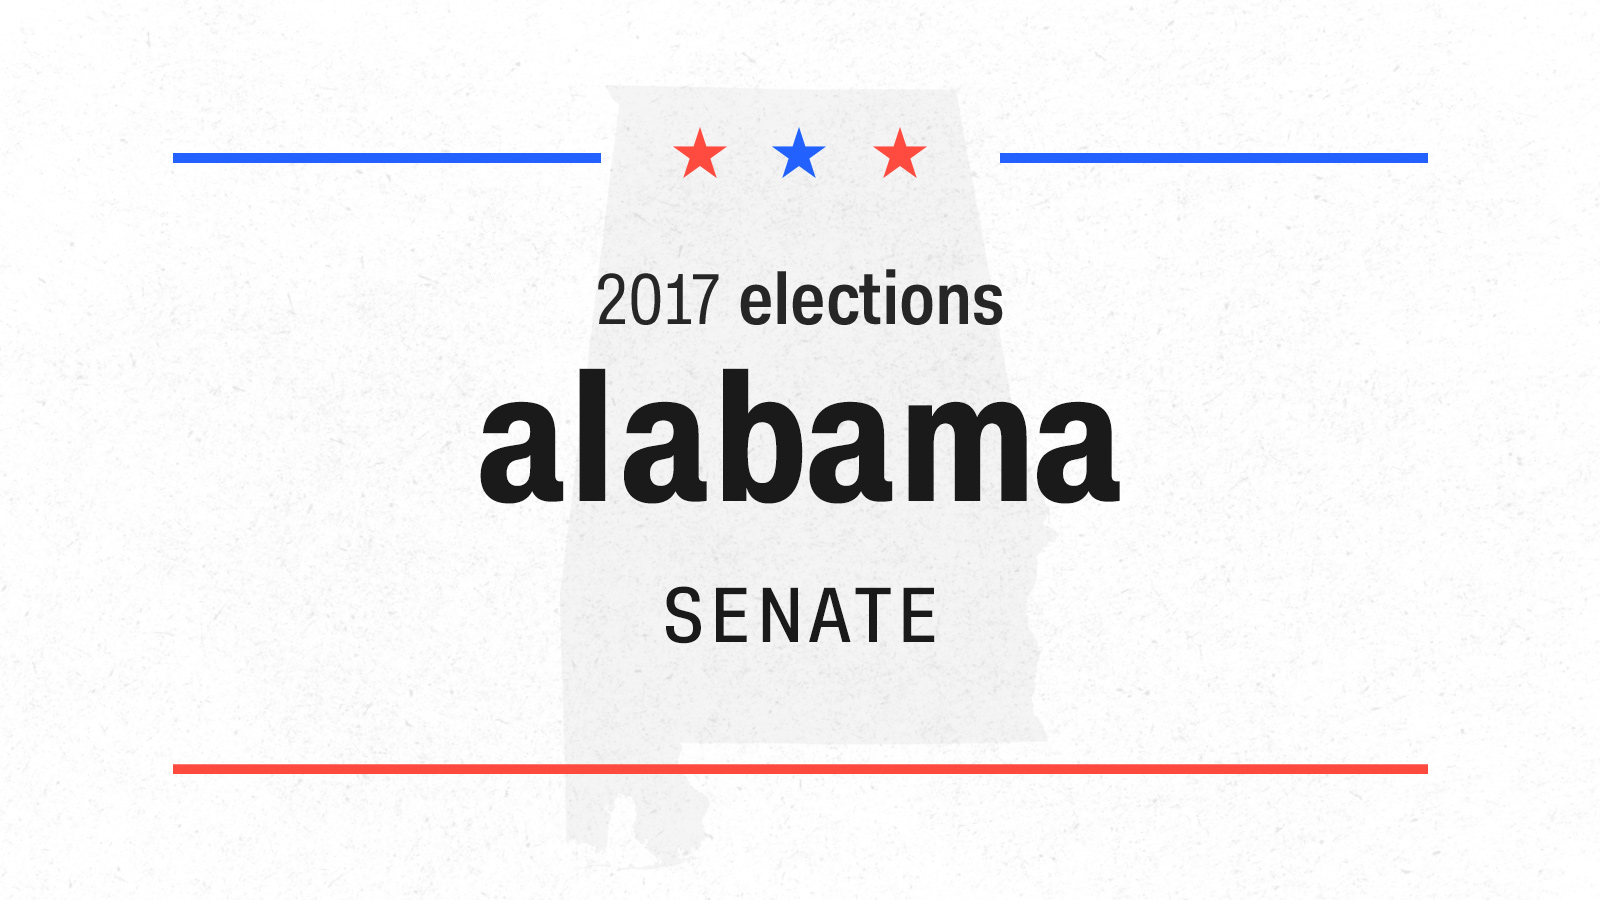 Alabama Senate race results 2017